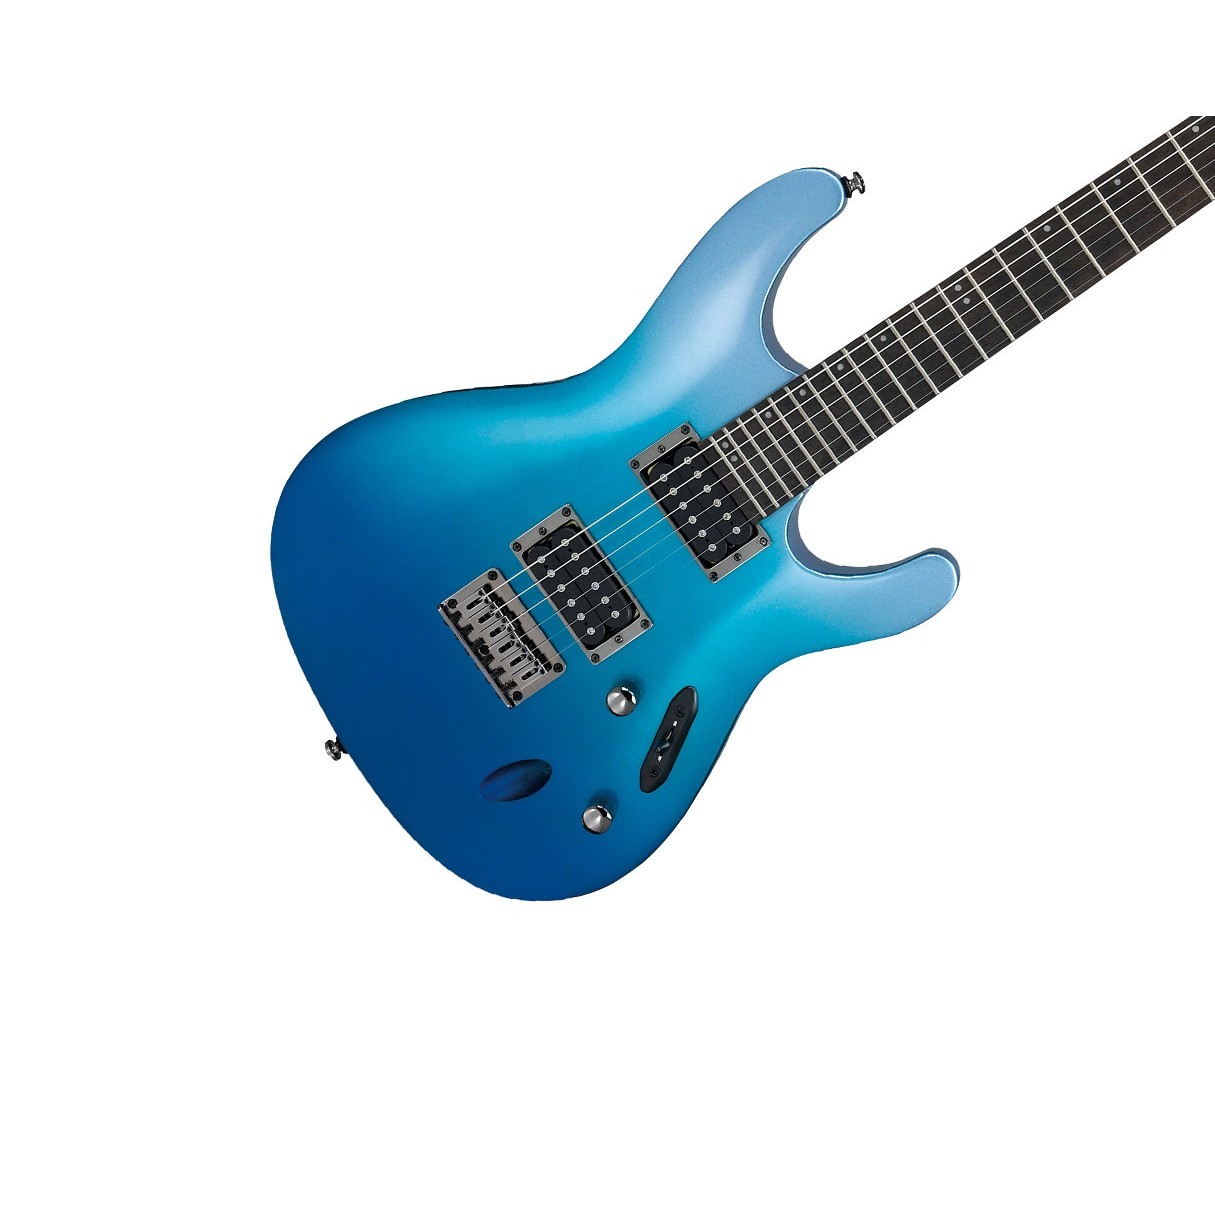 ibanez s standard 6str electric guitar ocean fade metallic. Black Bedroom Furniture Sets. Home Design Ideas